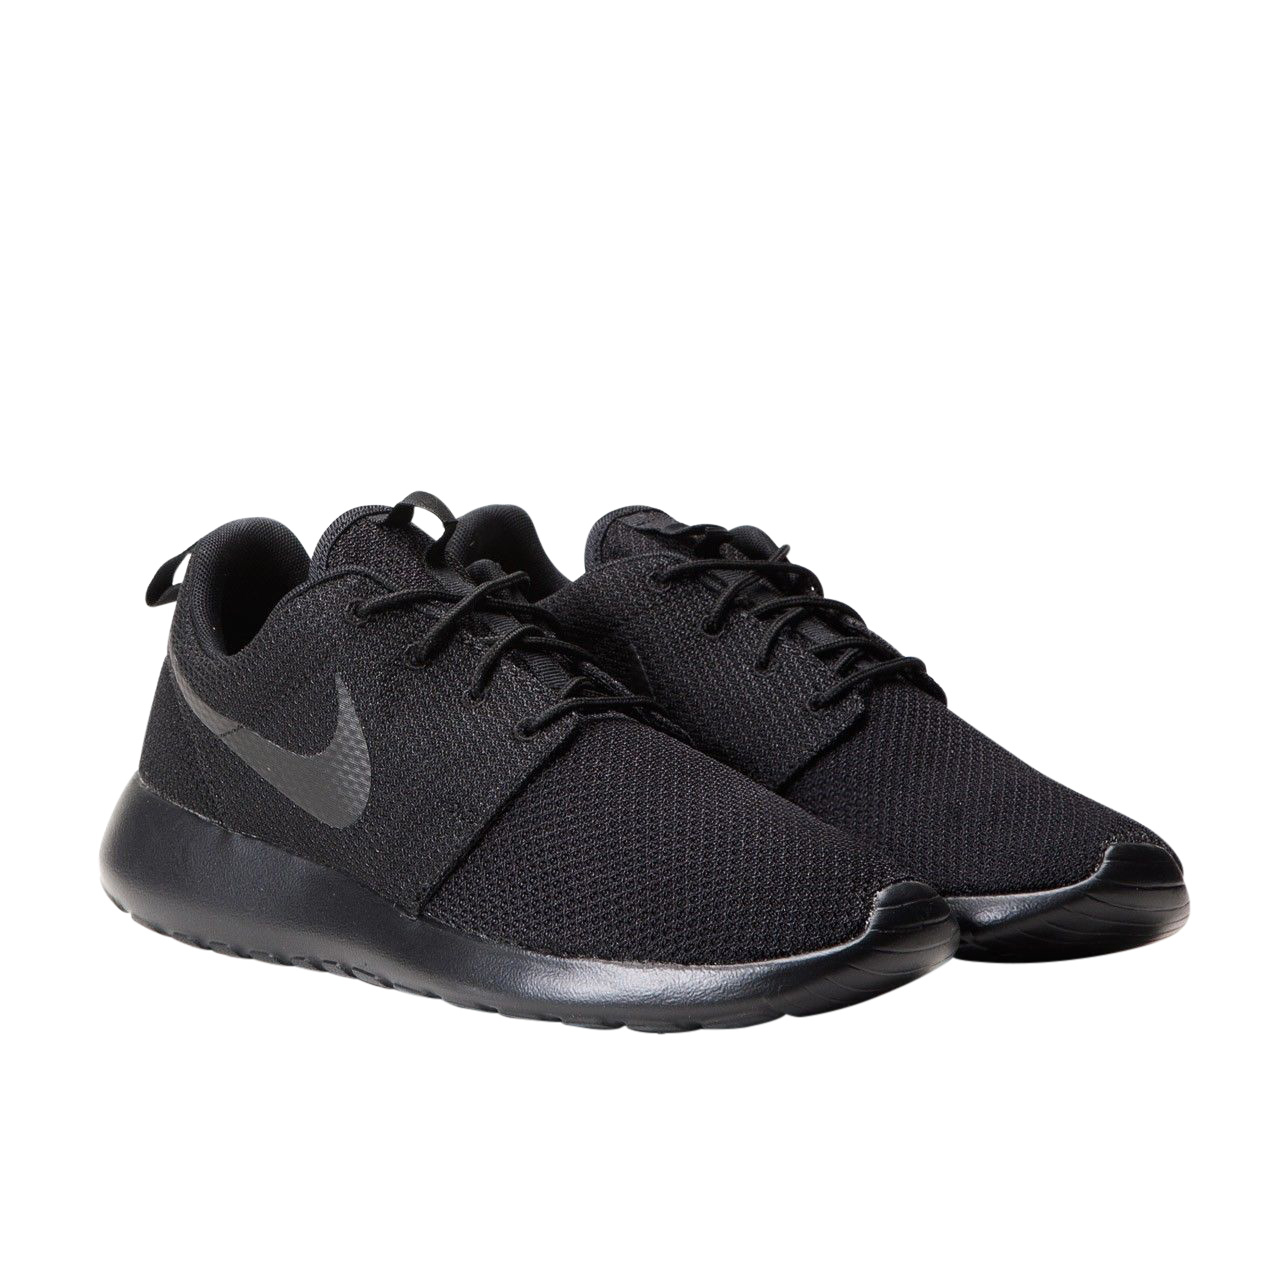 BUY Nike Roshe One Triple Black